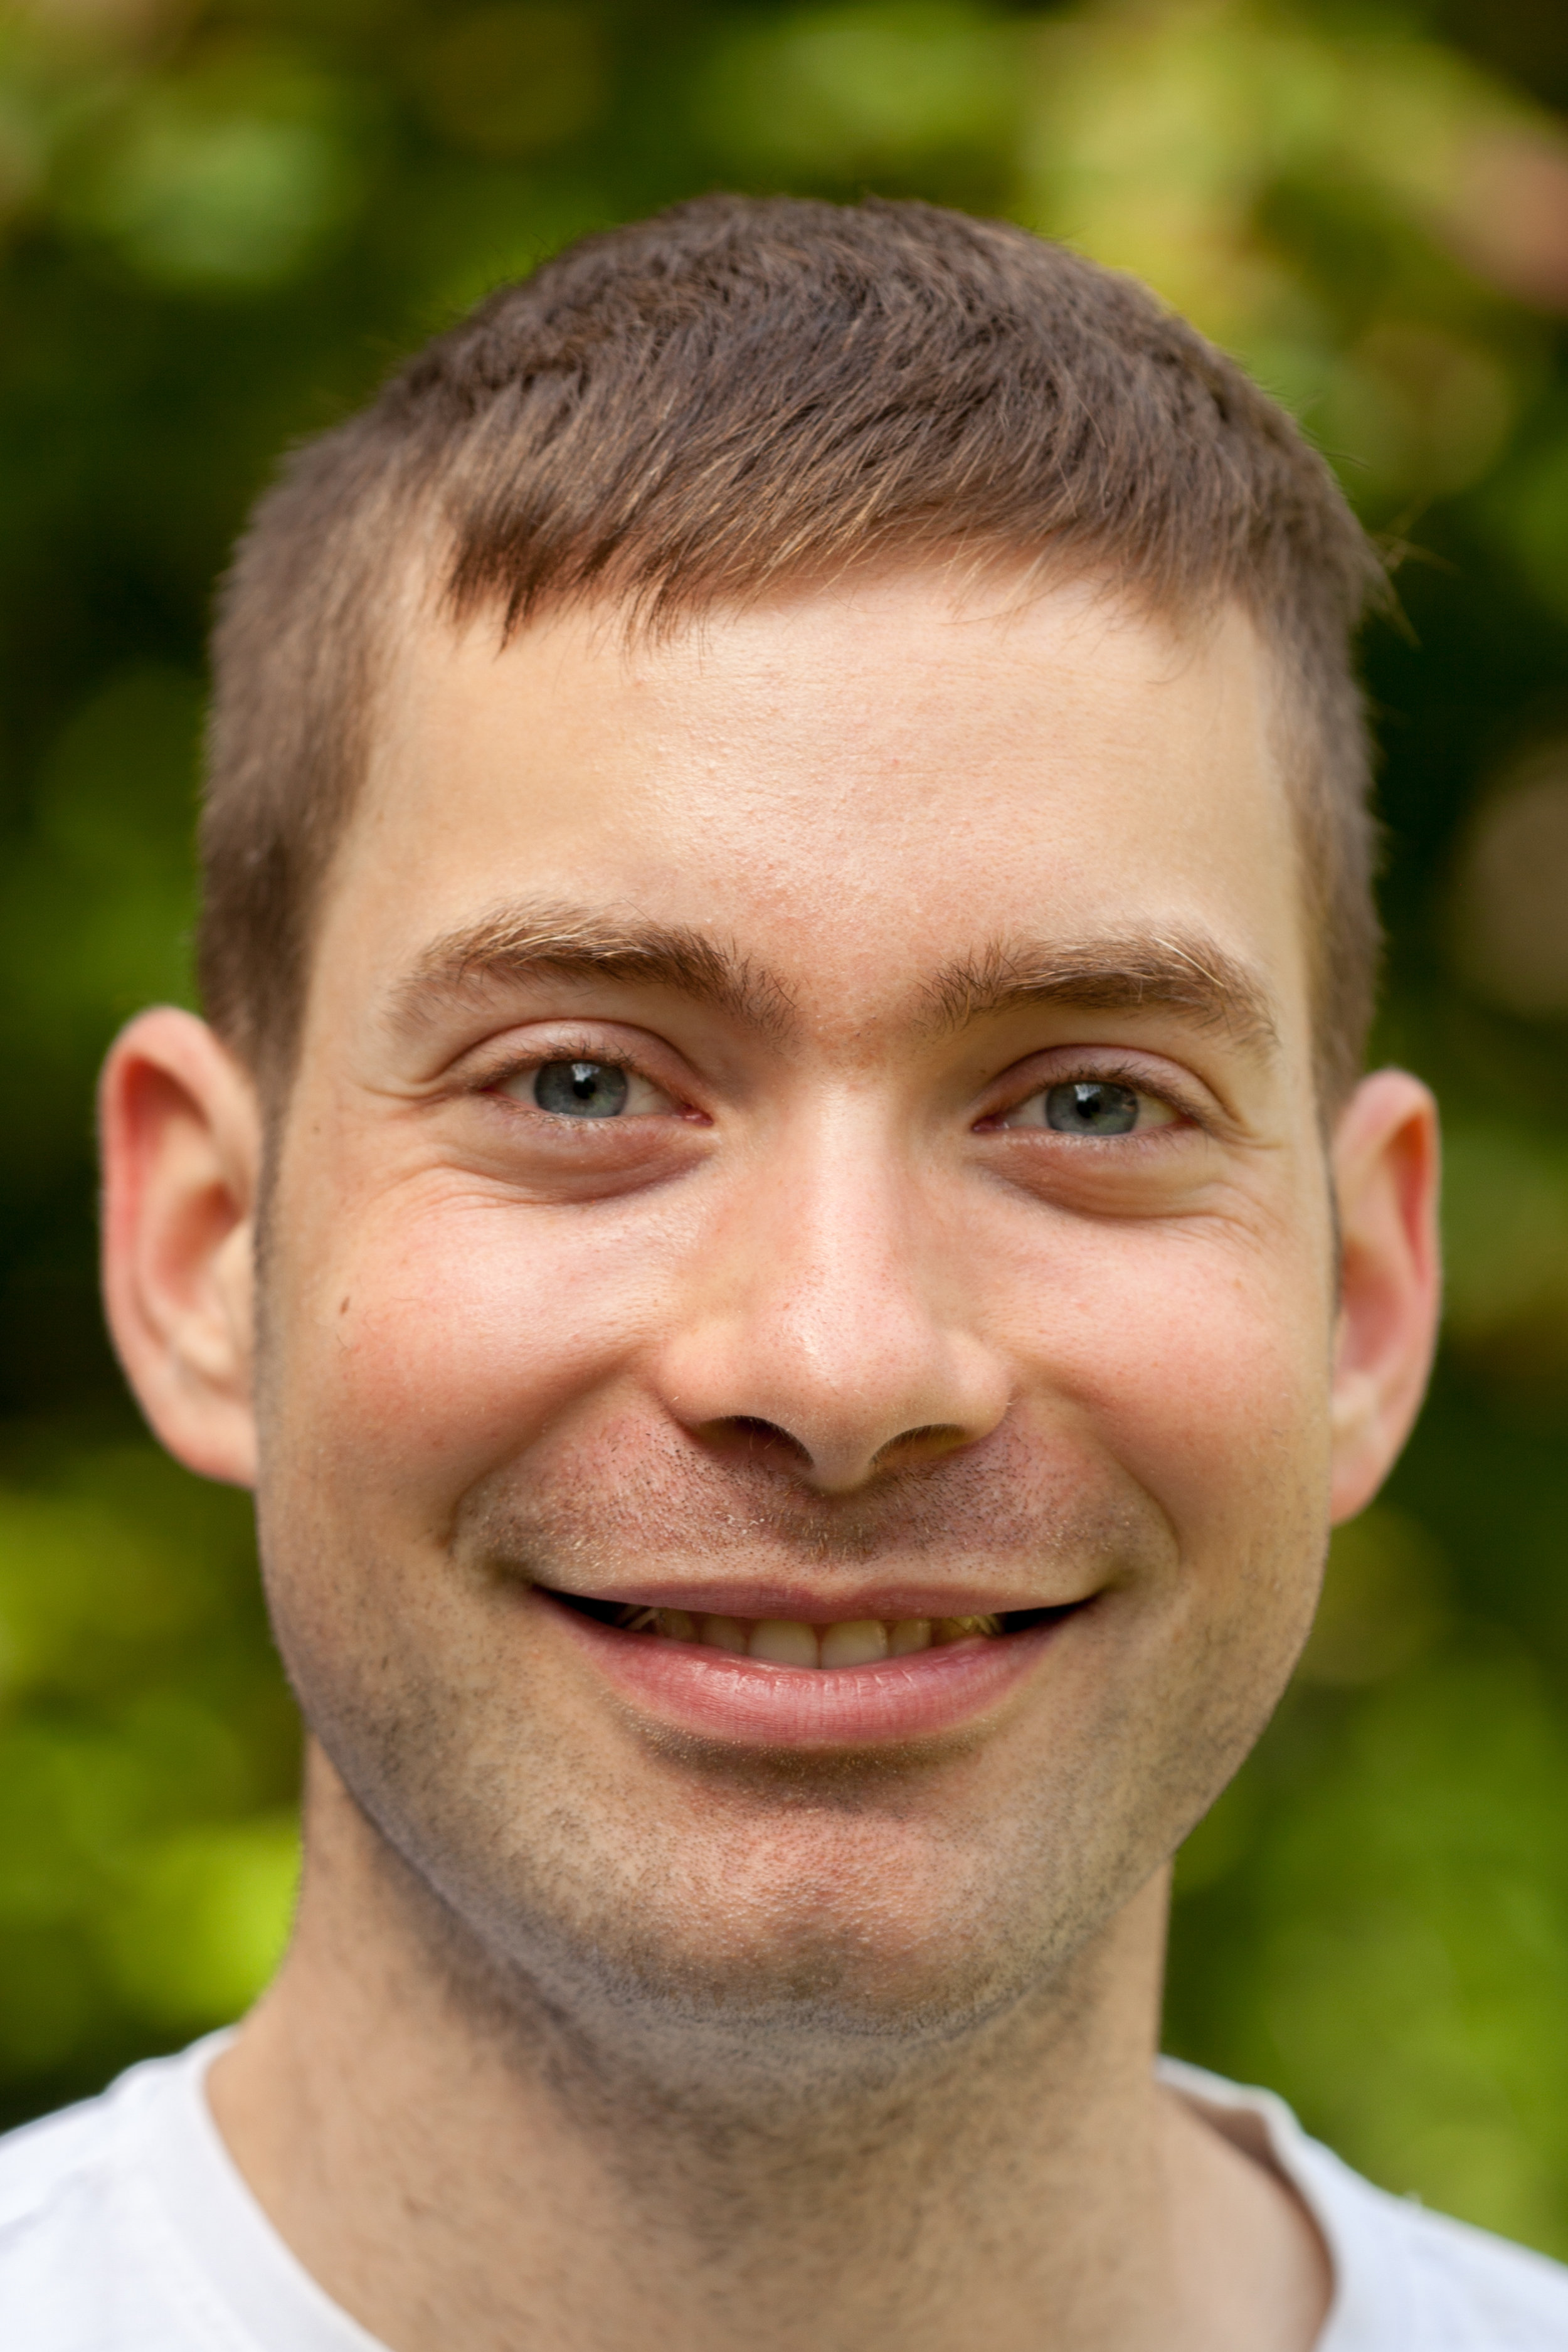 Cristian Riccio - Wellcome Trust Sanger Institute PhD Student (joint with Martin Hemberg)cristian@cristian-riccio.chwww.cristian-riccio.ch